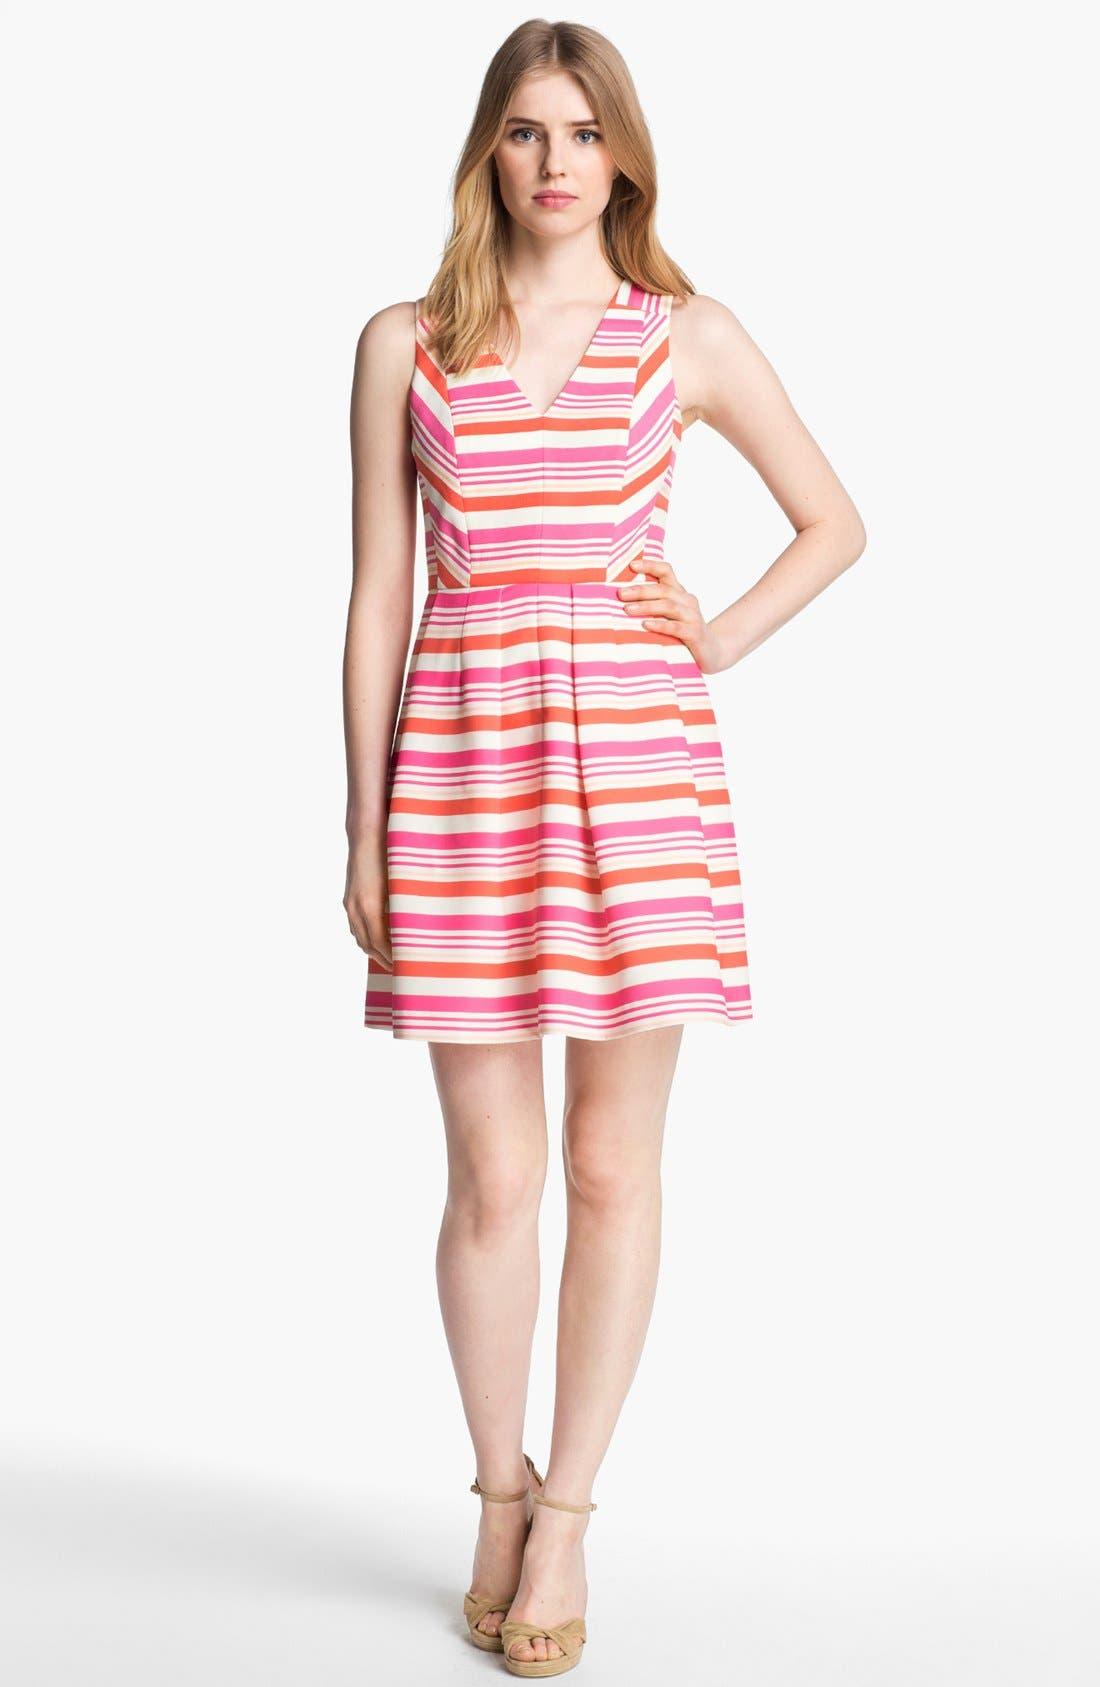 Alternate Image 1 Selected - Mcginn 'Hattie' Fit & Flare Dress